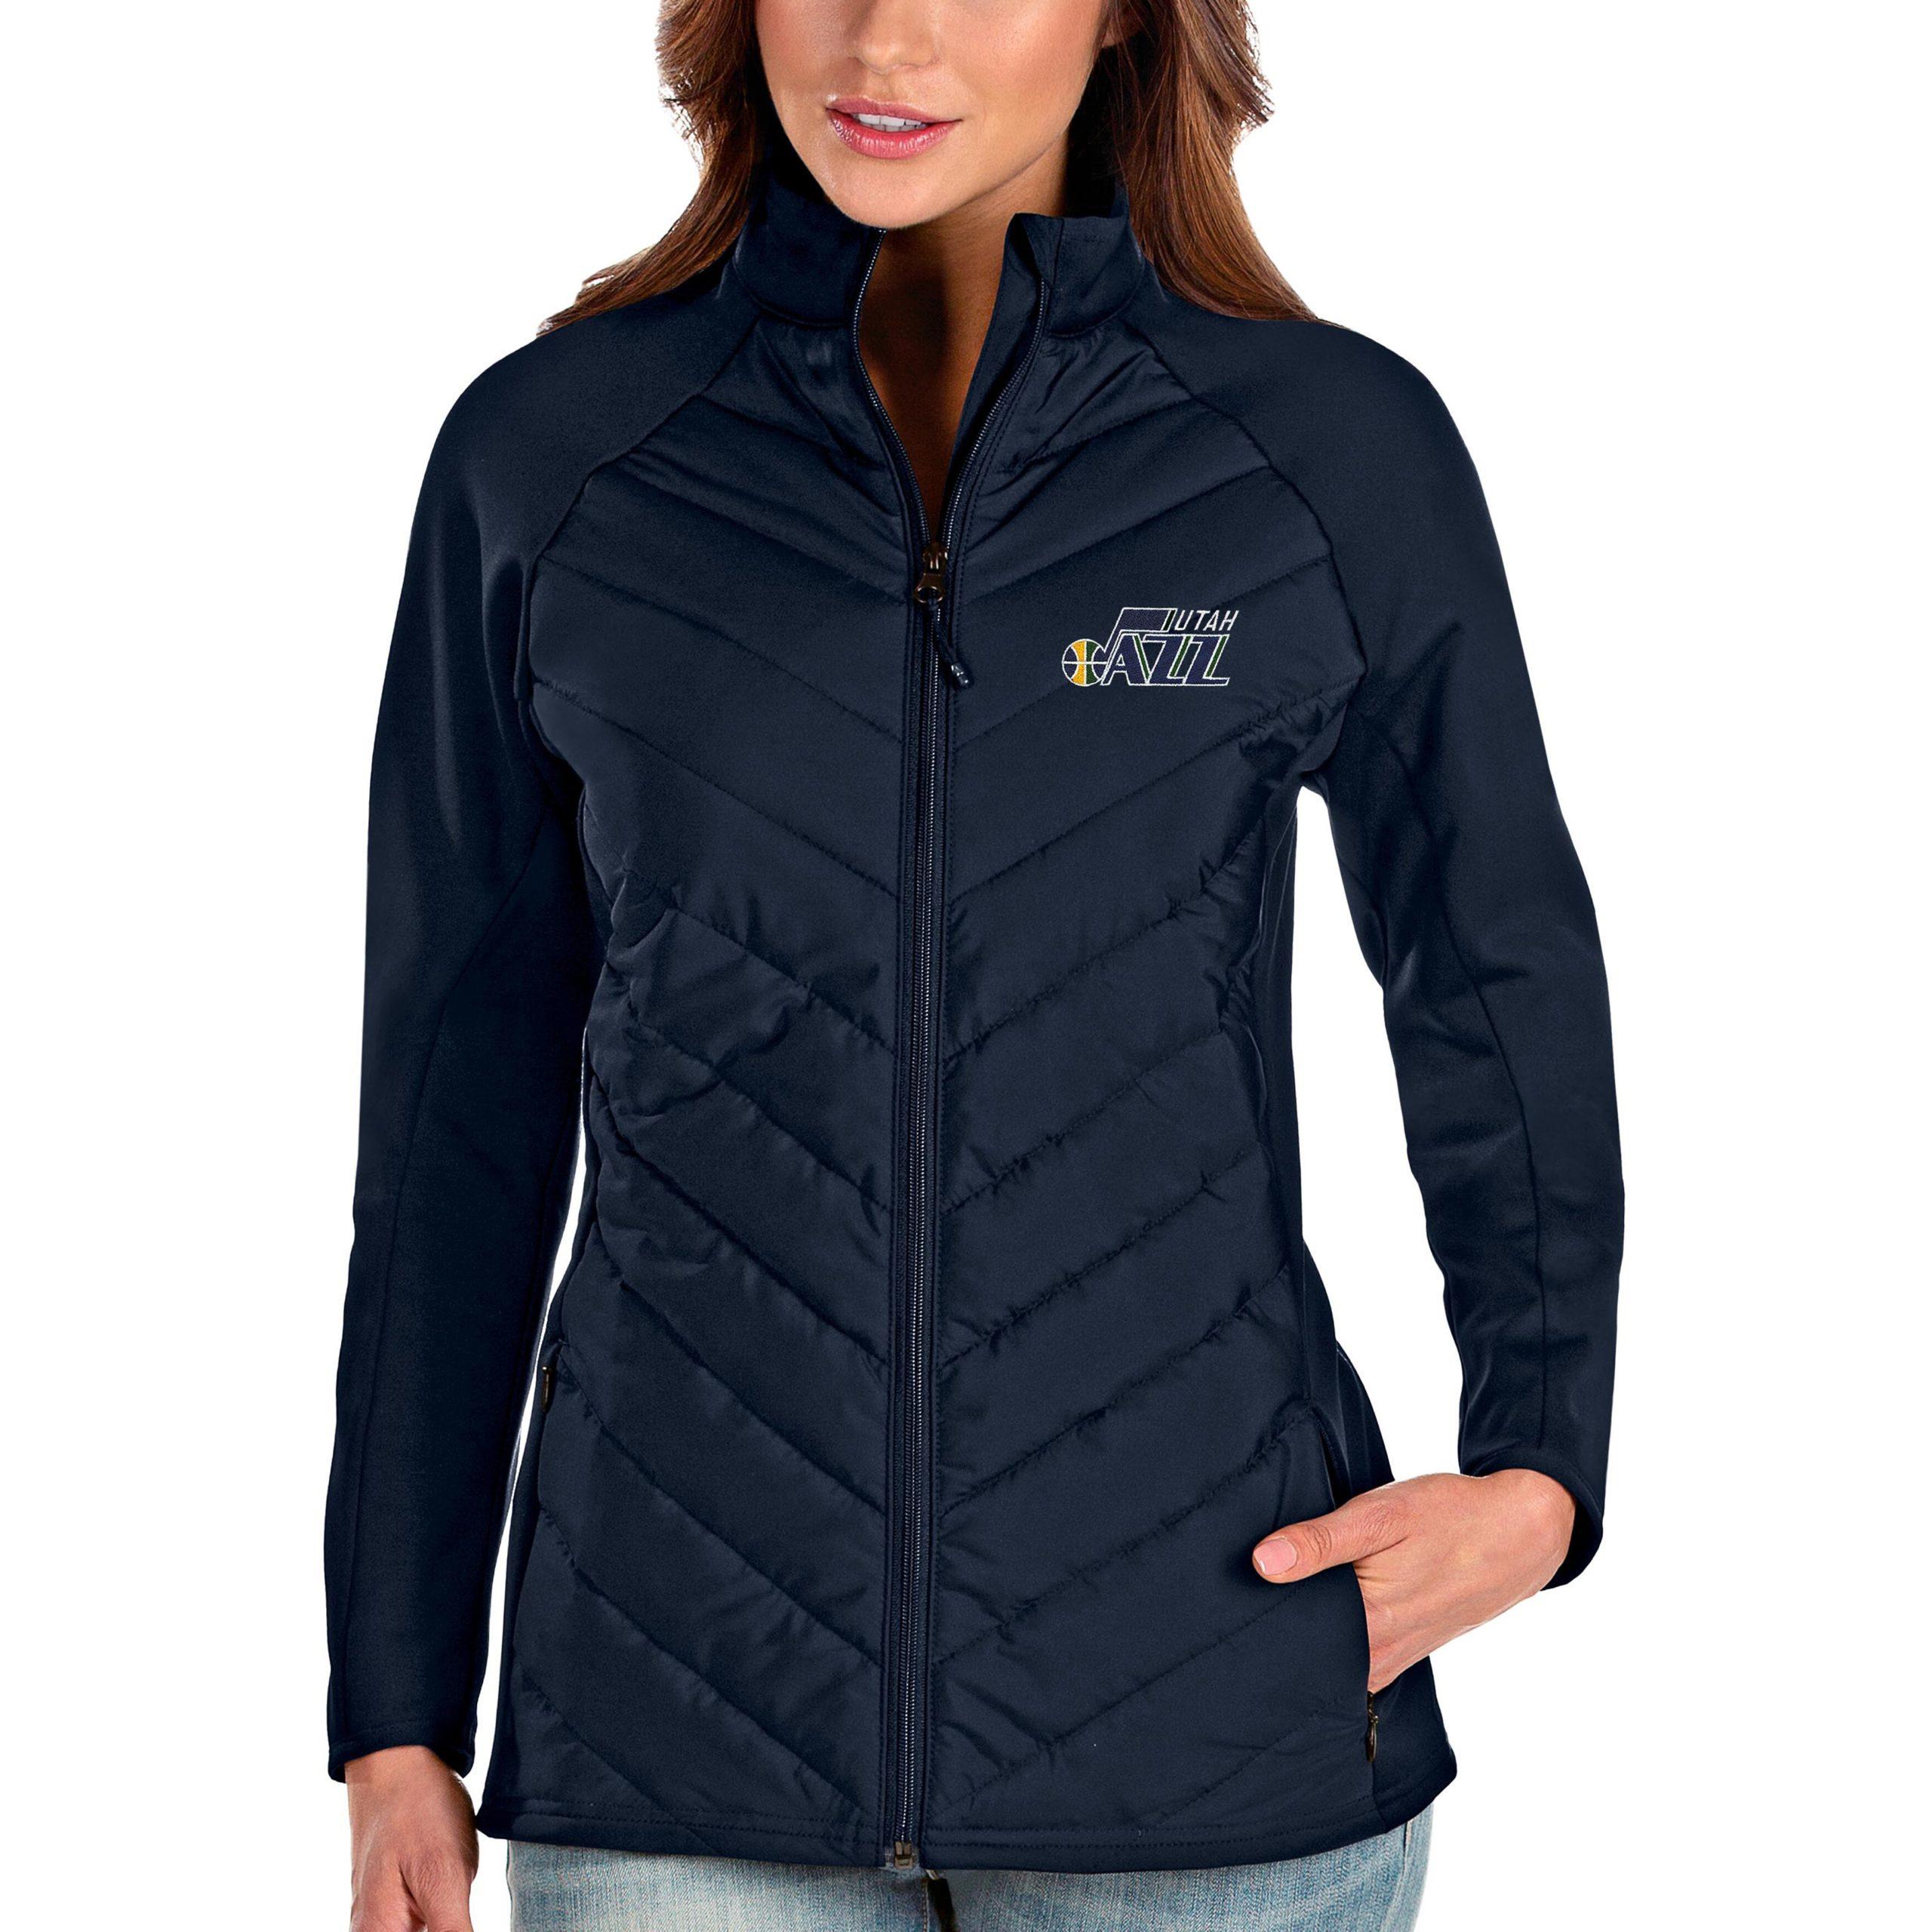 Utah Jazz Antigua Women's Altitude Full-Zip Jacket - Navy